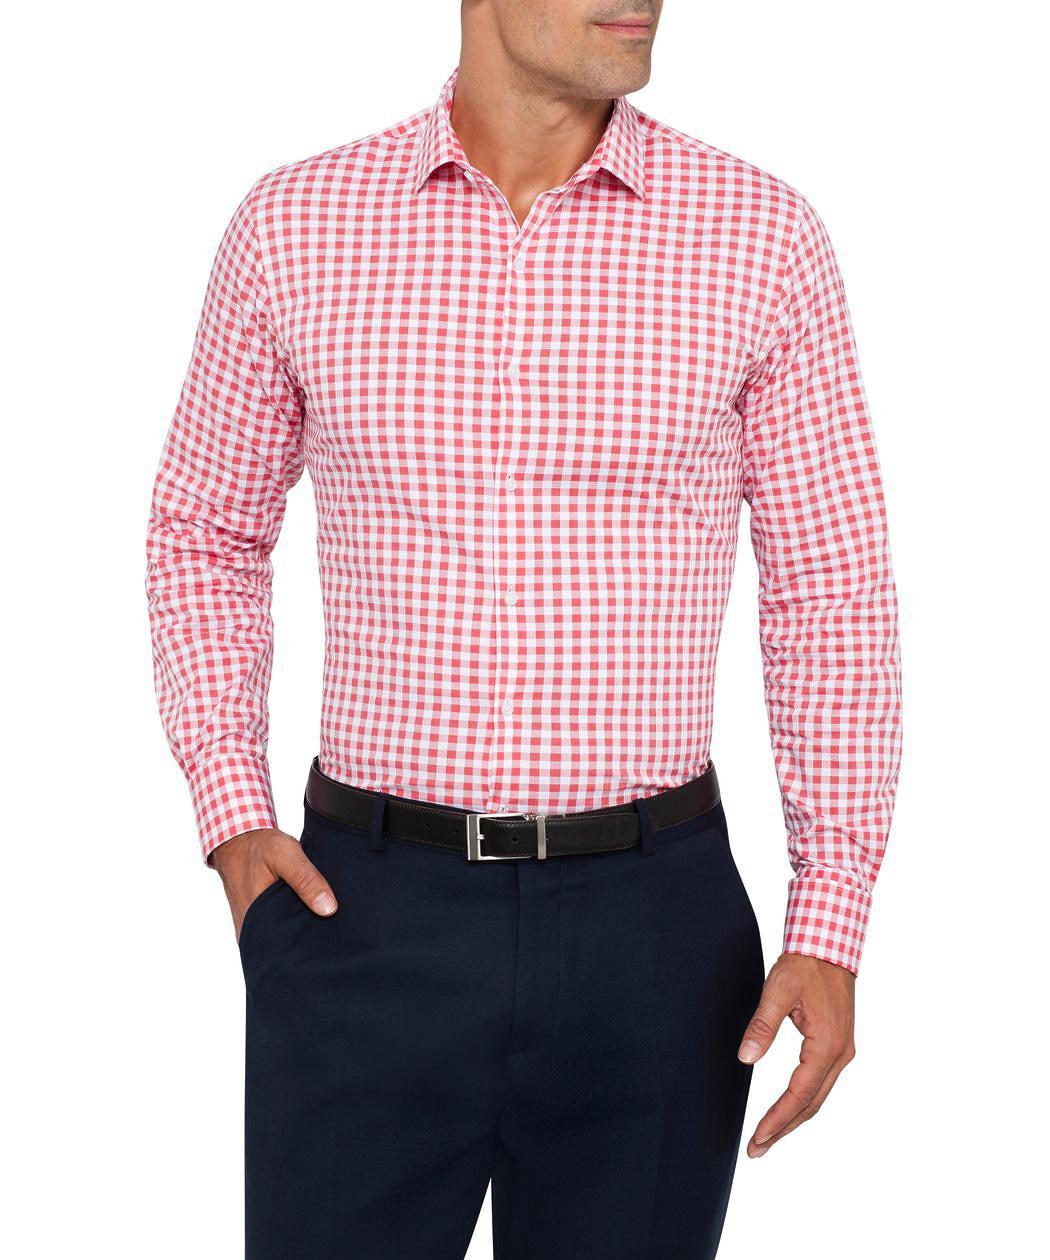 Van Heusen Slim Fit White and Red Check Shirt | Van Heusen Men's ...